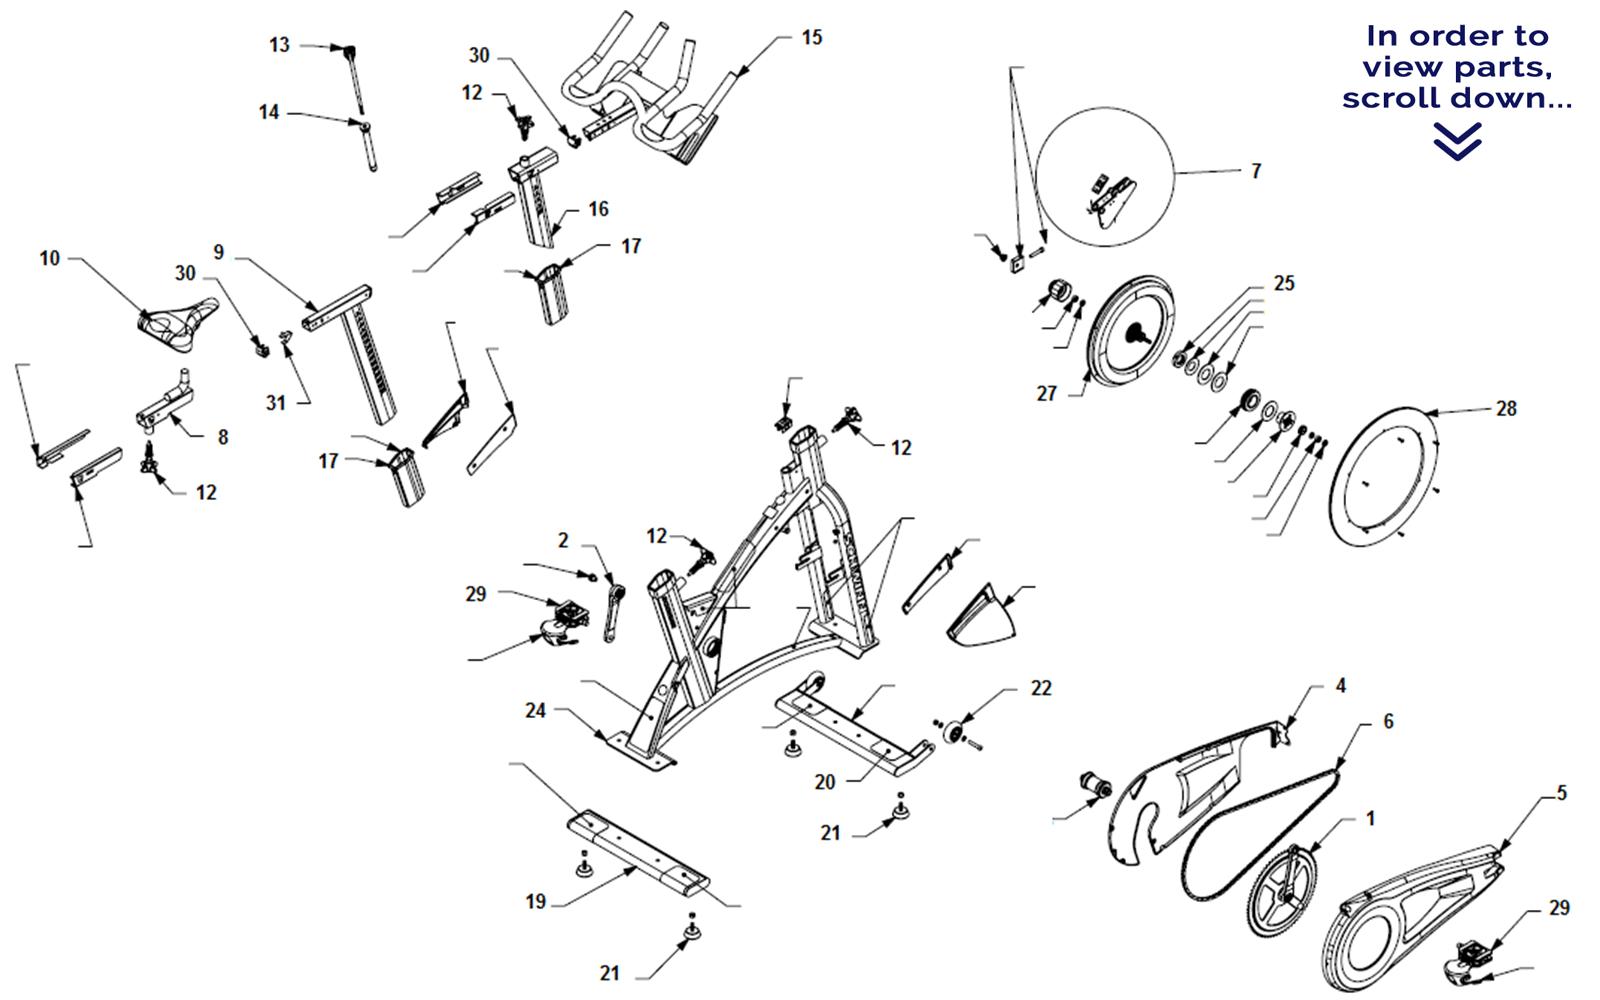 bike parts diagram tornado supercell schwinn ac performance scroll down to view